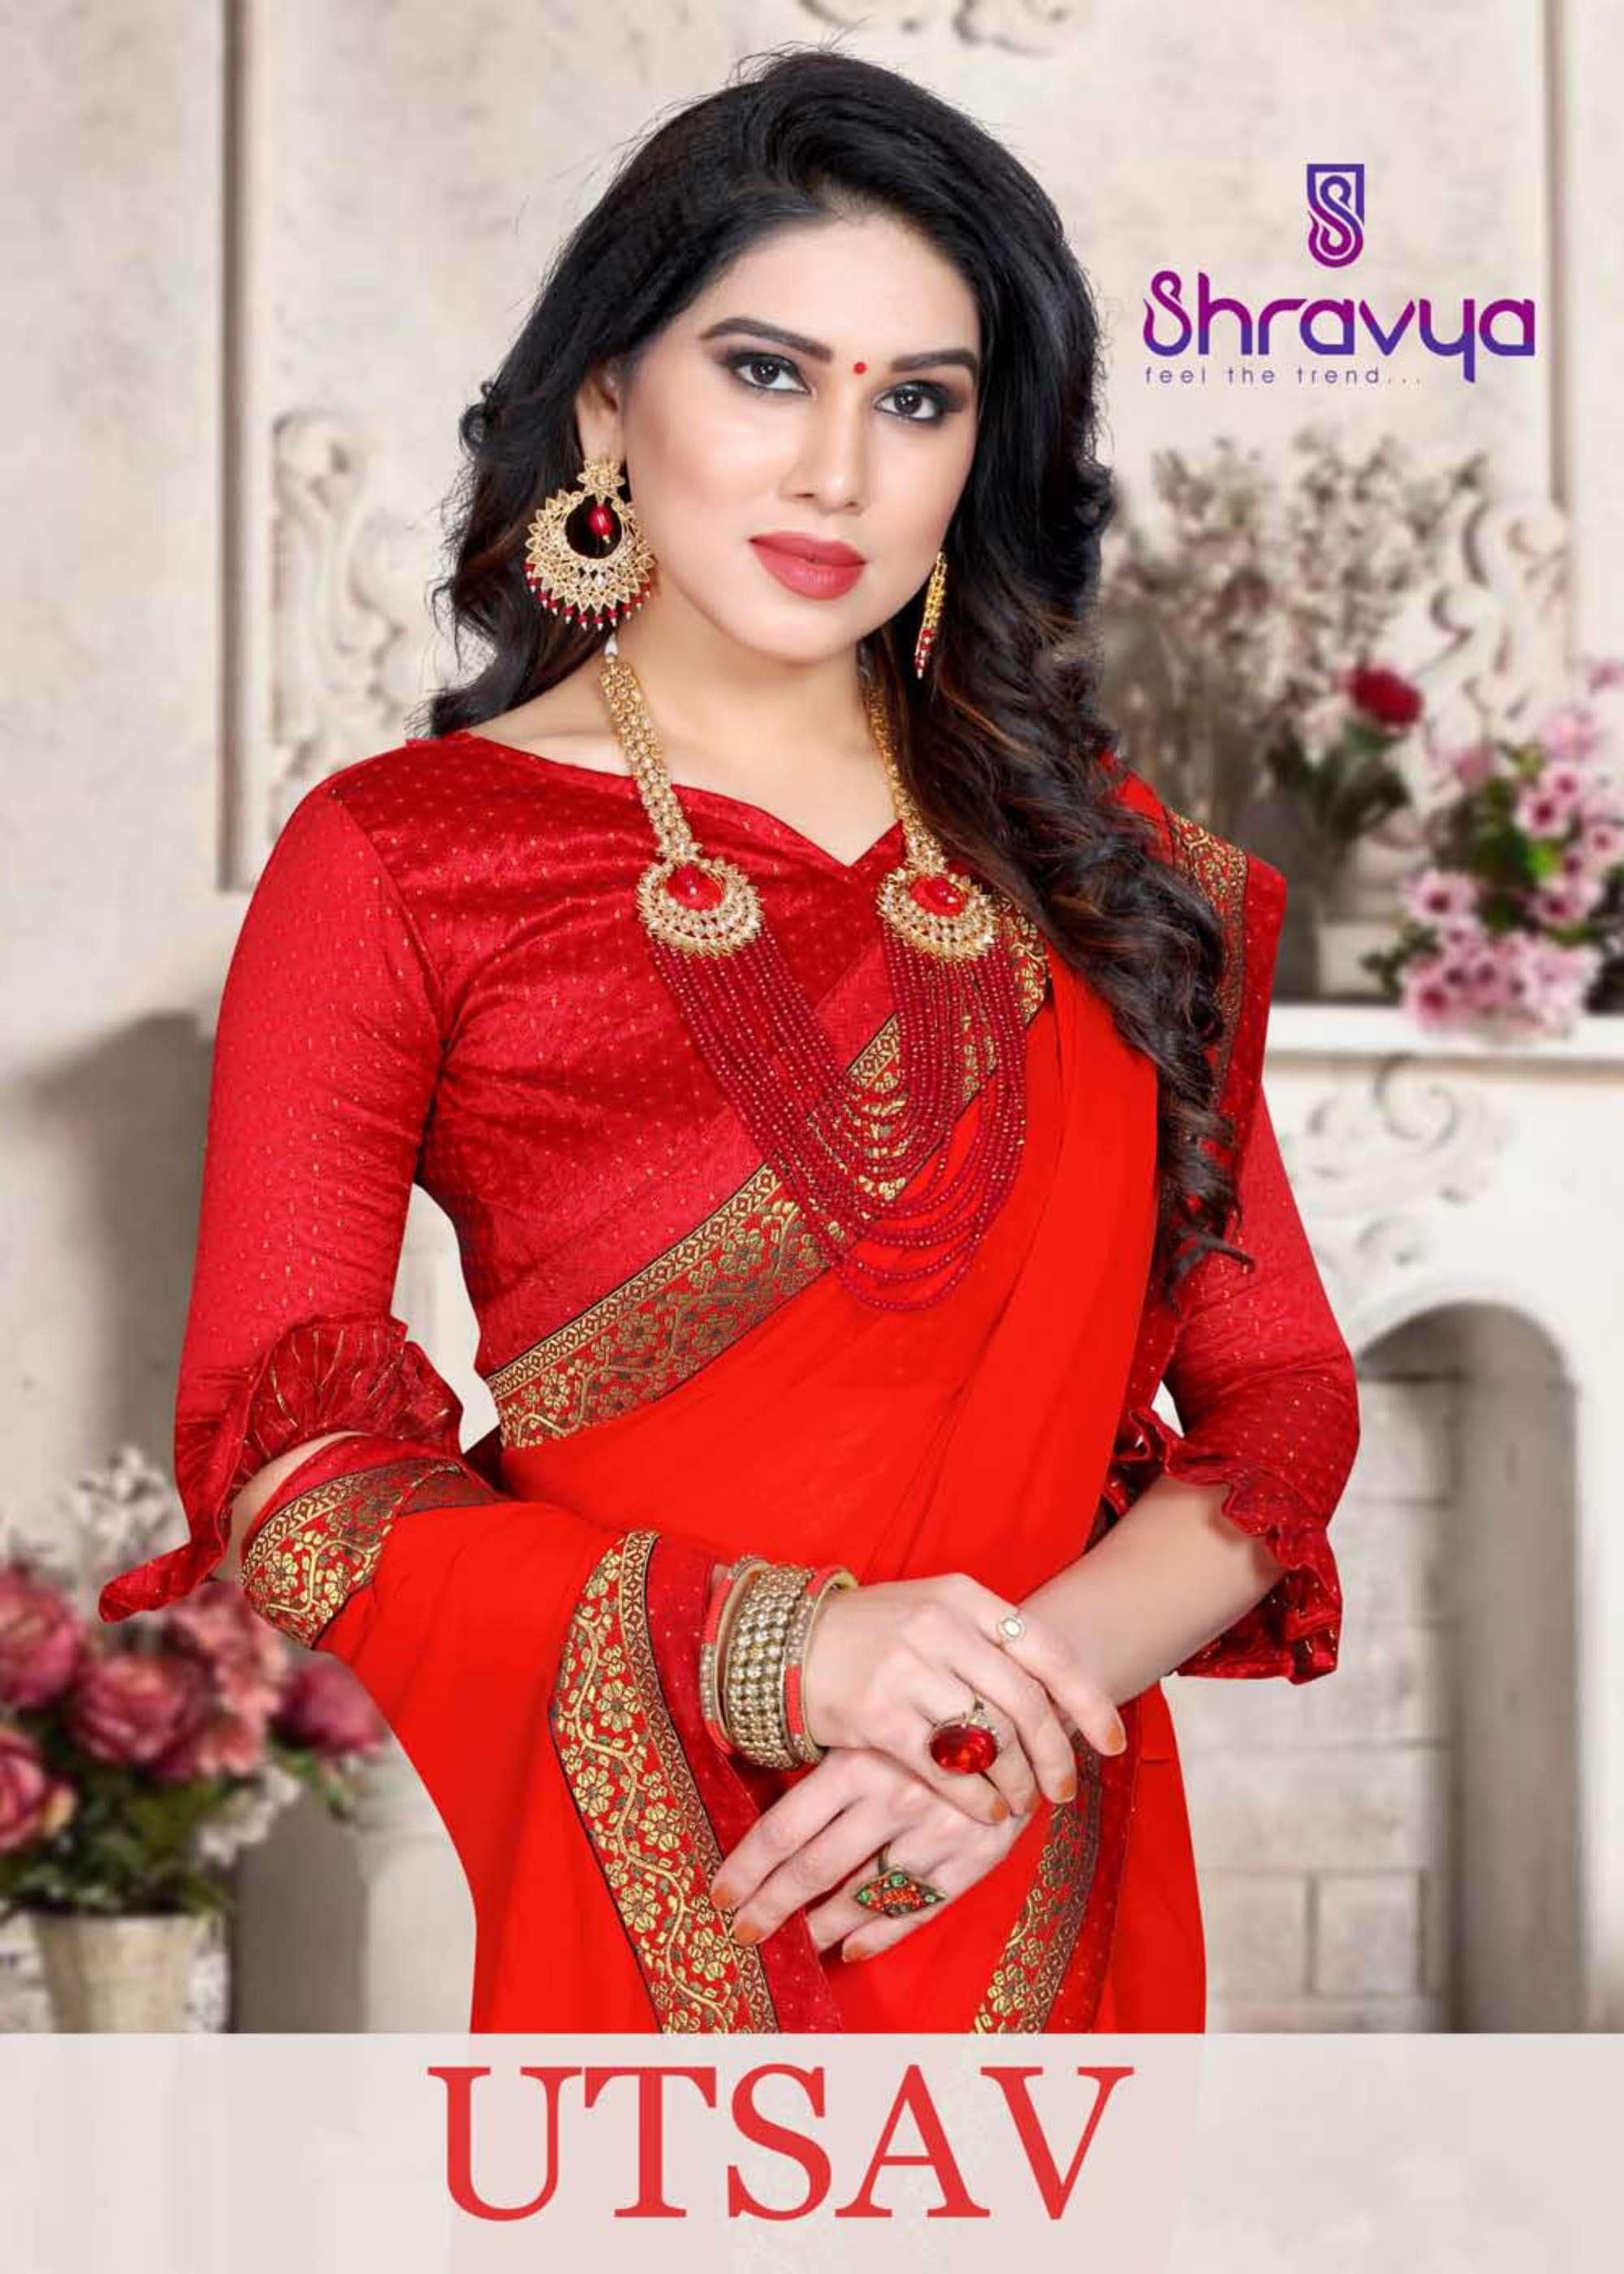 Utsav By Shravya Fashion Wholesale Saree Exporter